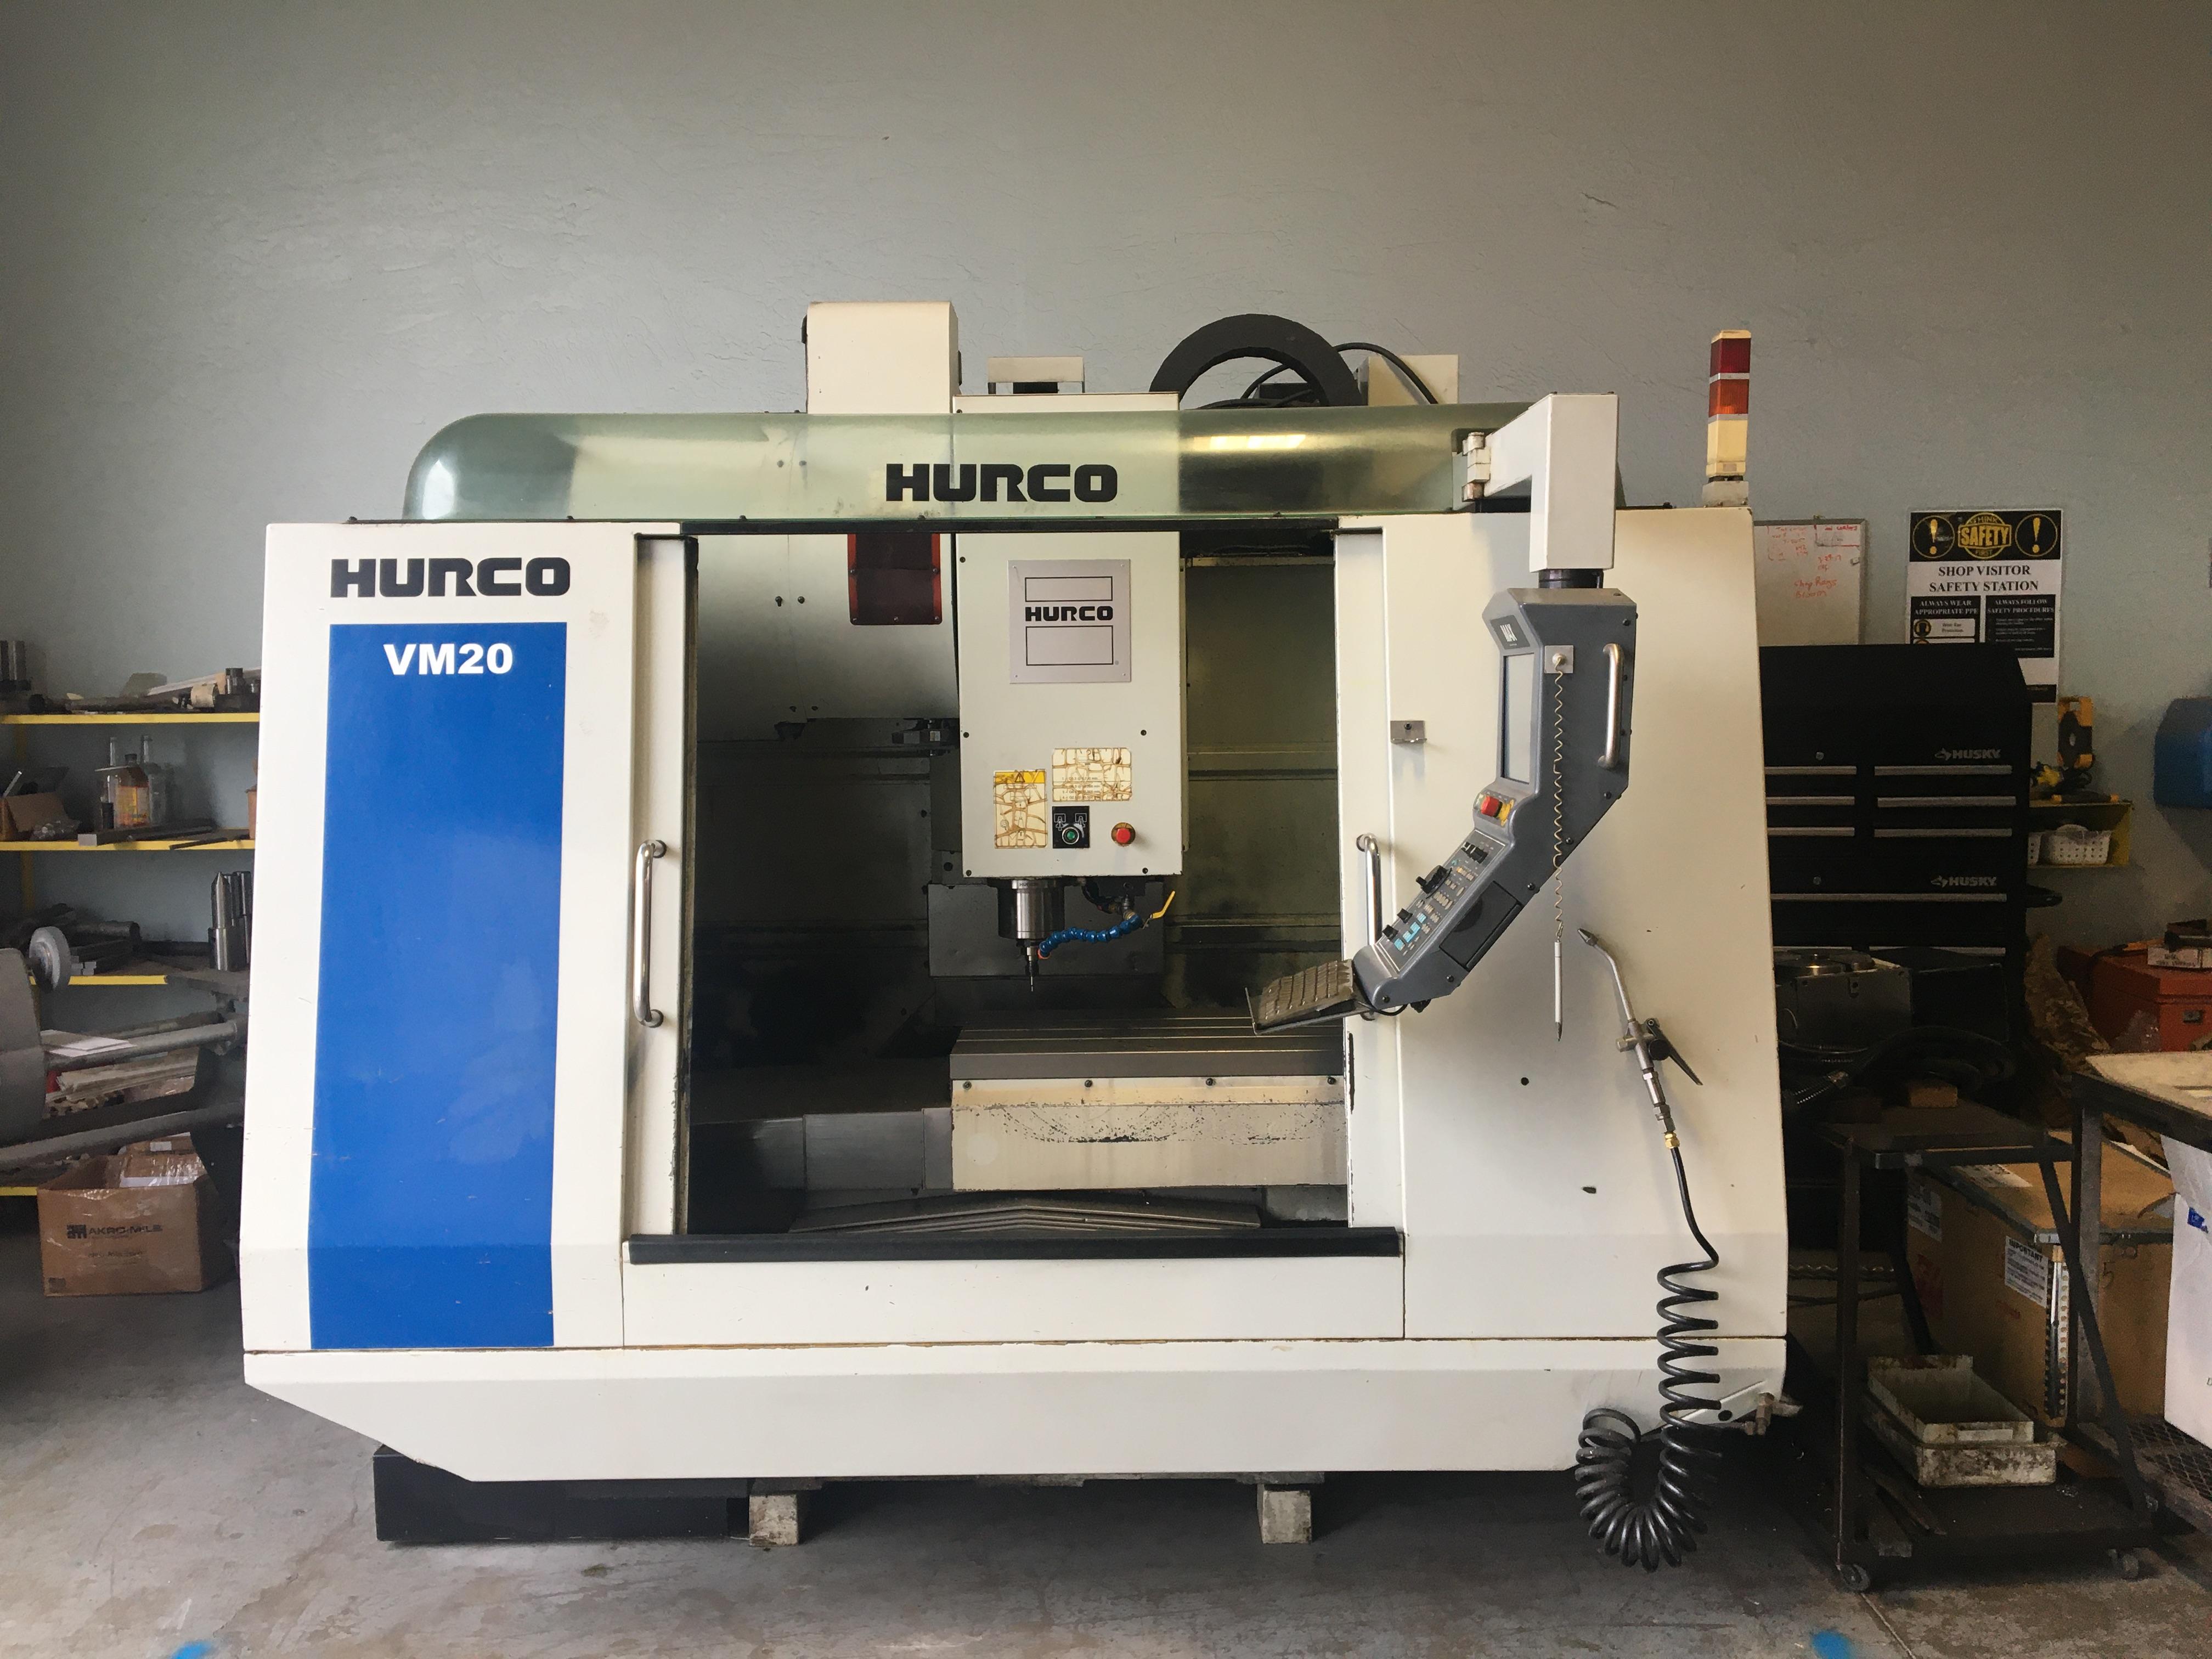 Hurco VM20 VMC 2008 Winmax 9 CNC Control 4th Axis Ready